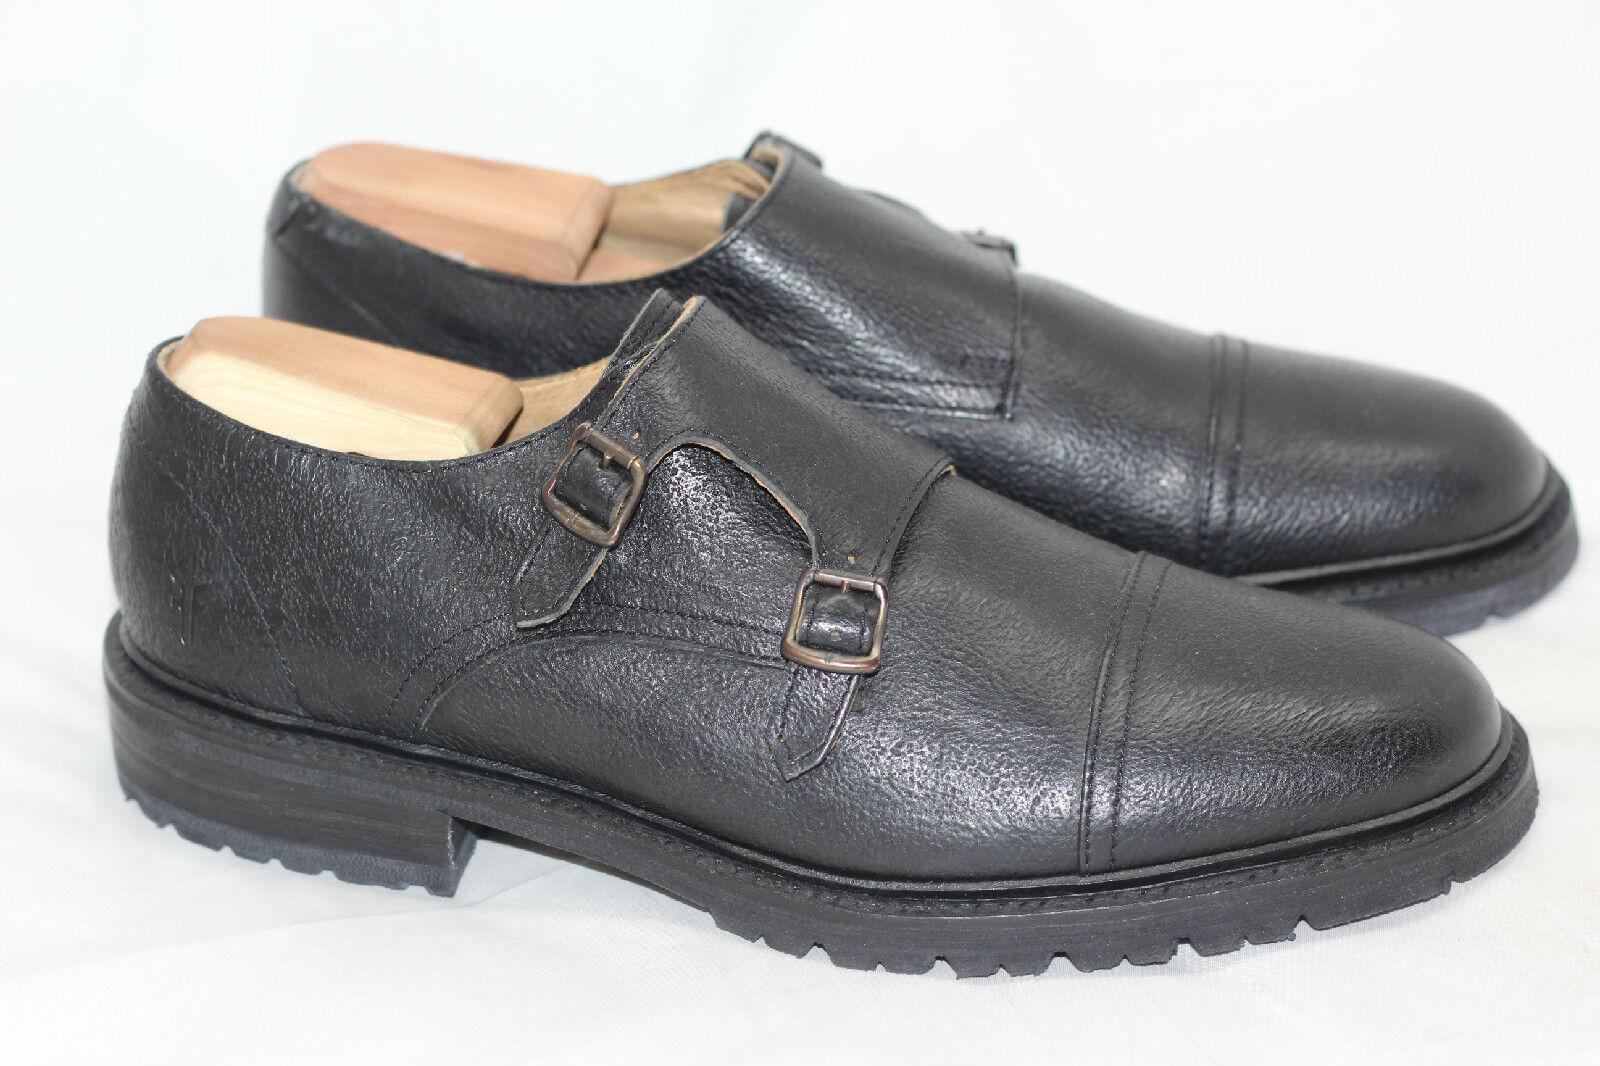 Nuevos zapatos de faja Frye James Lug Monk - negro talla 9D (w78)